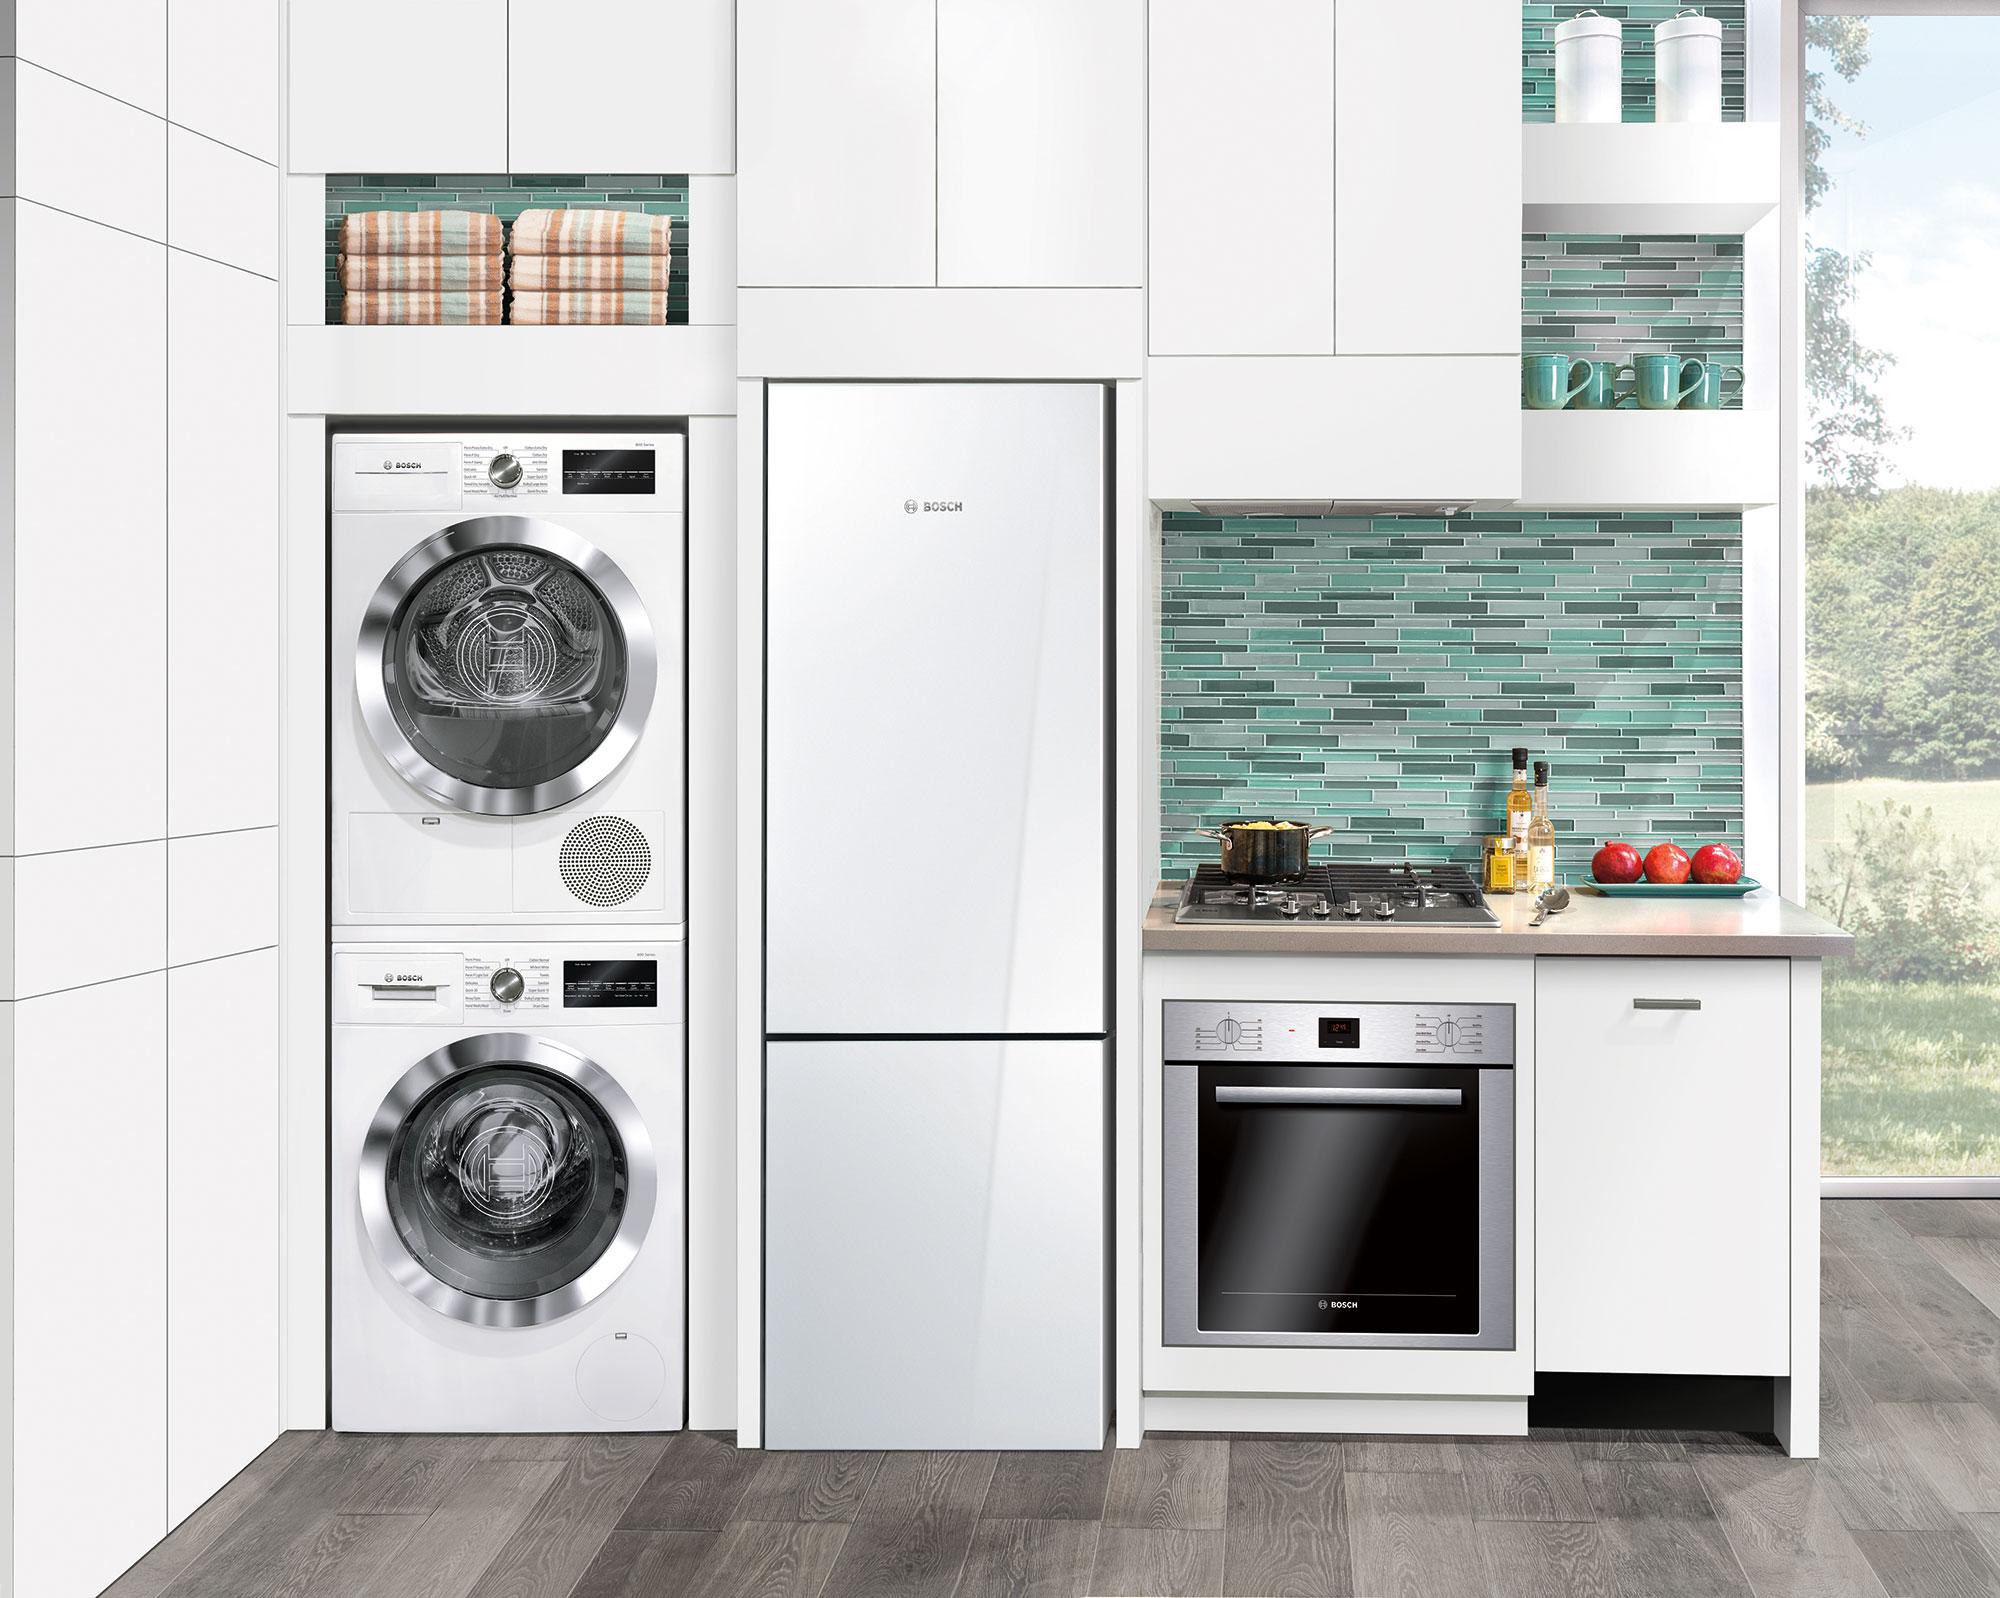 stackable washer dryer set in kitchen